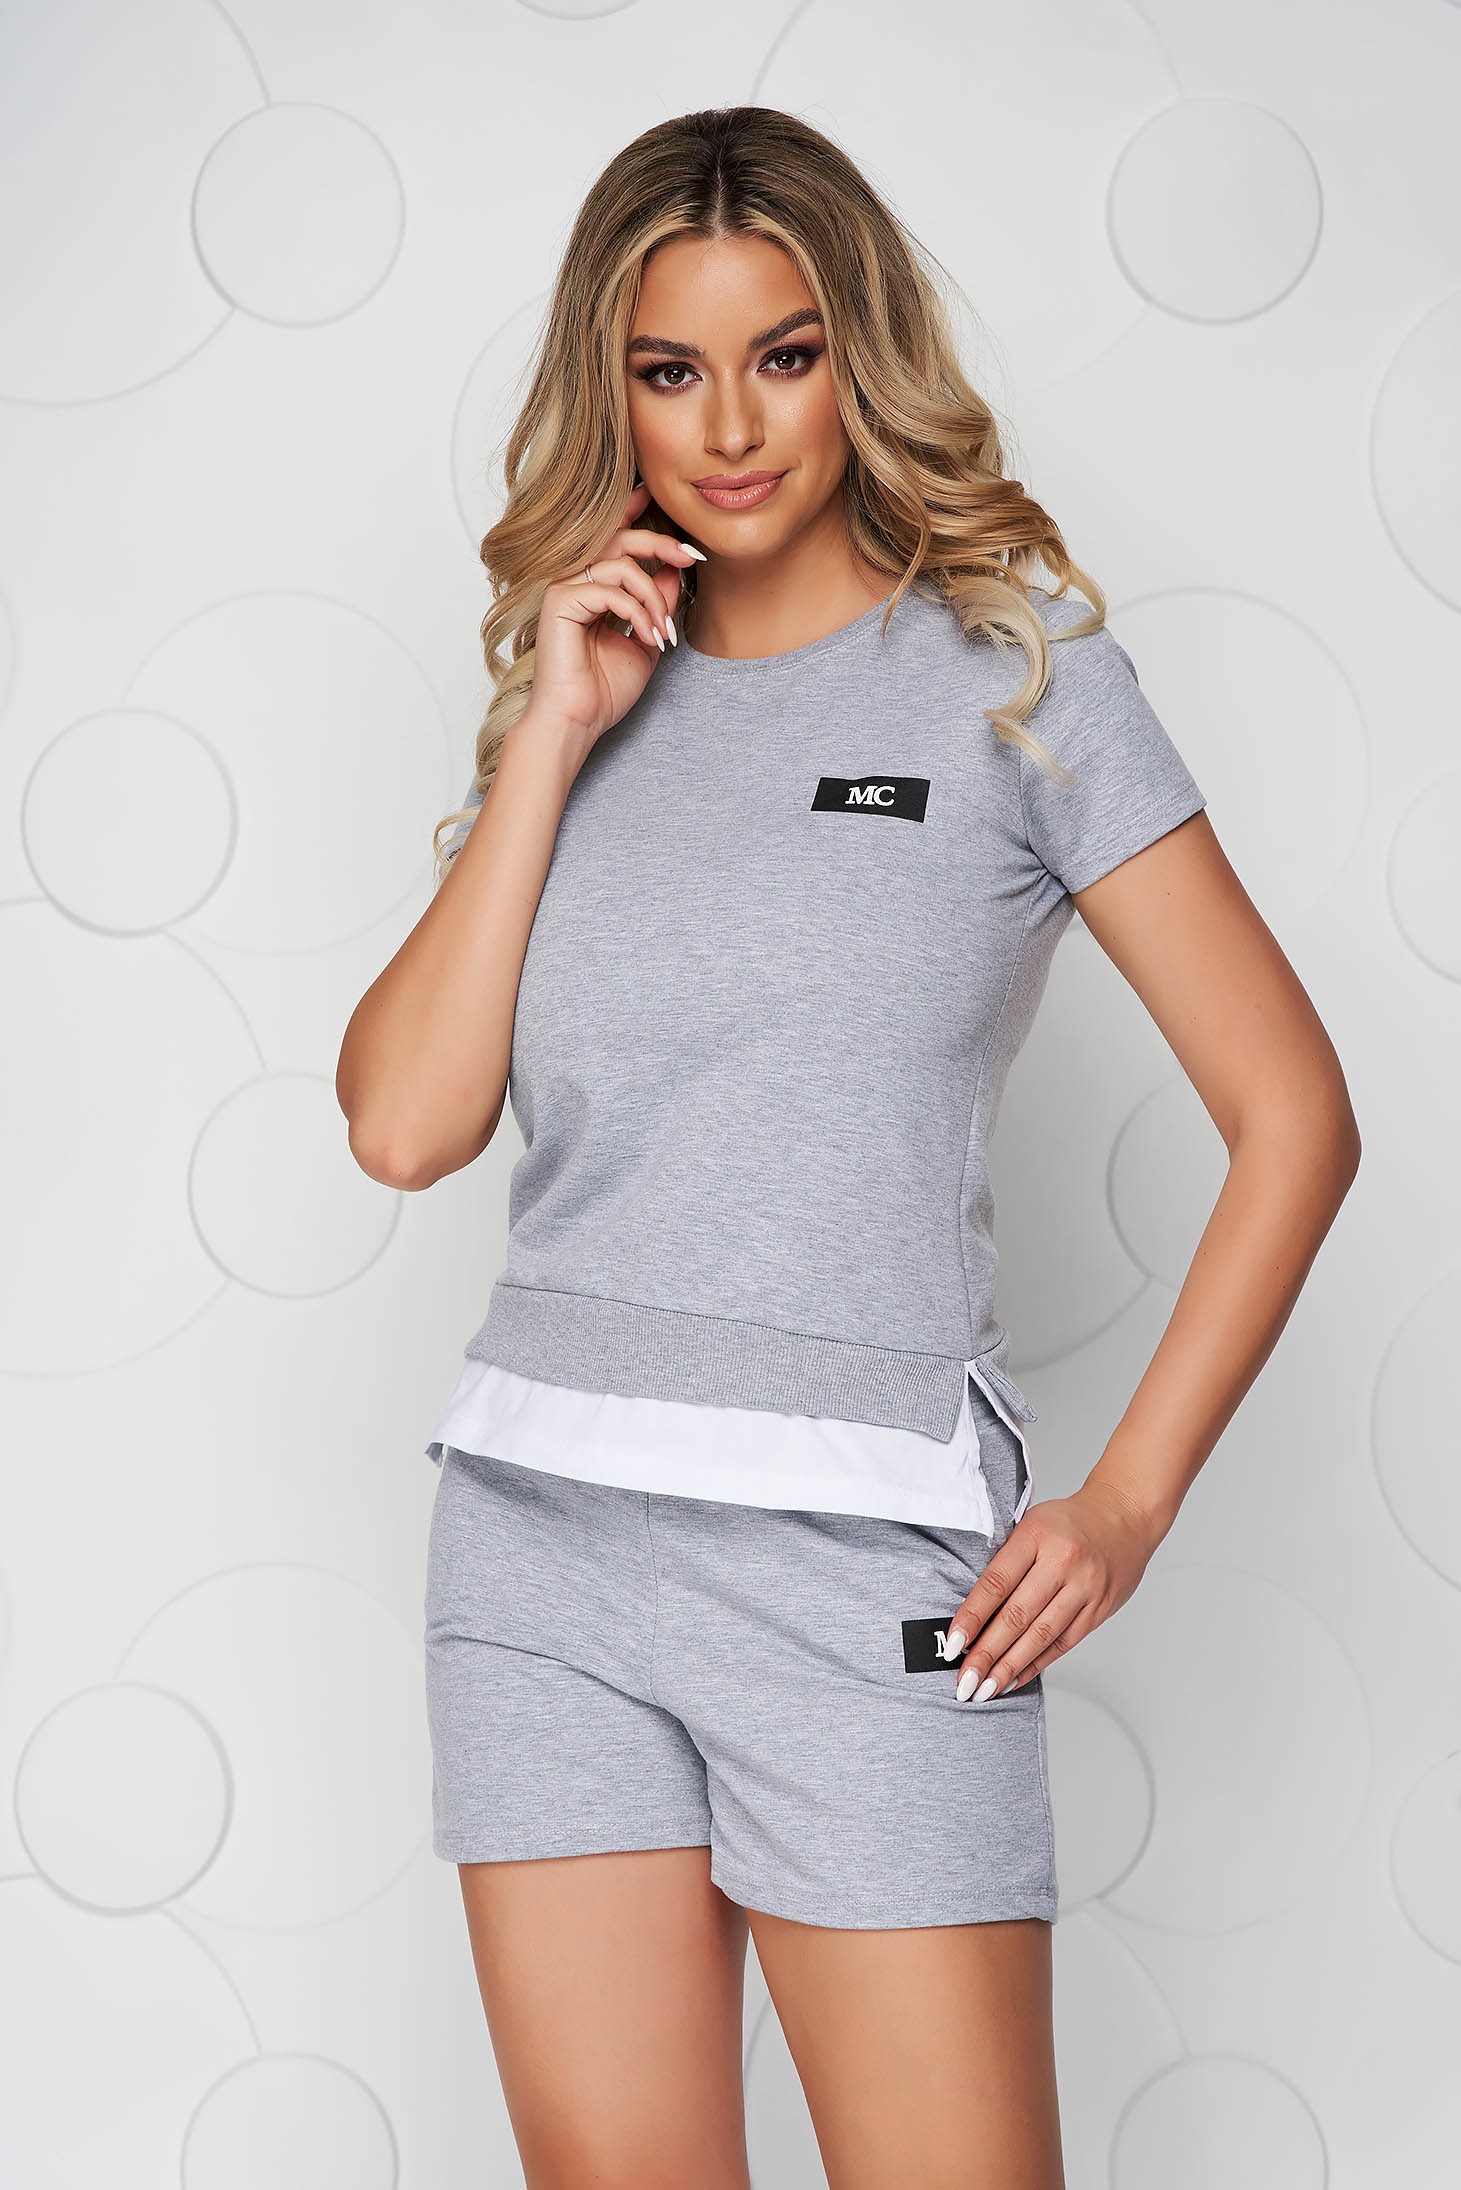 Grey sport 2 pieces cotton women`s shorts women`s t-shirt